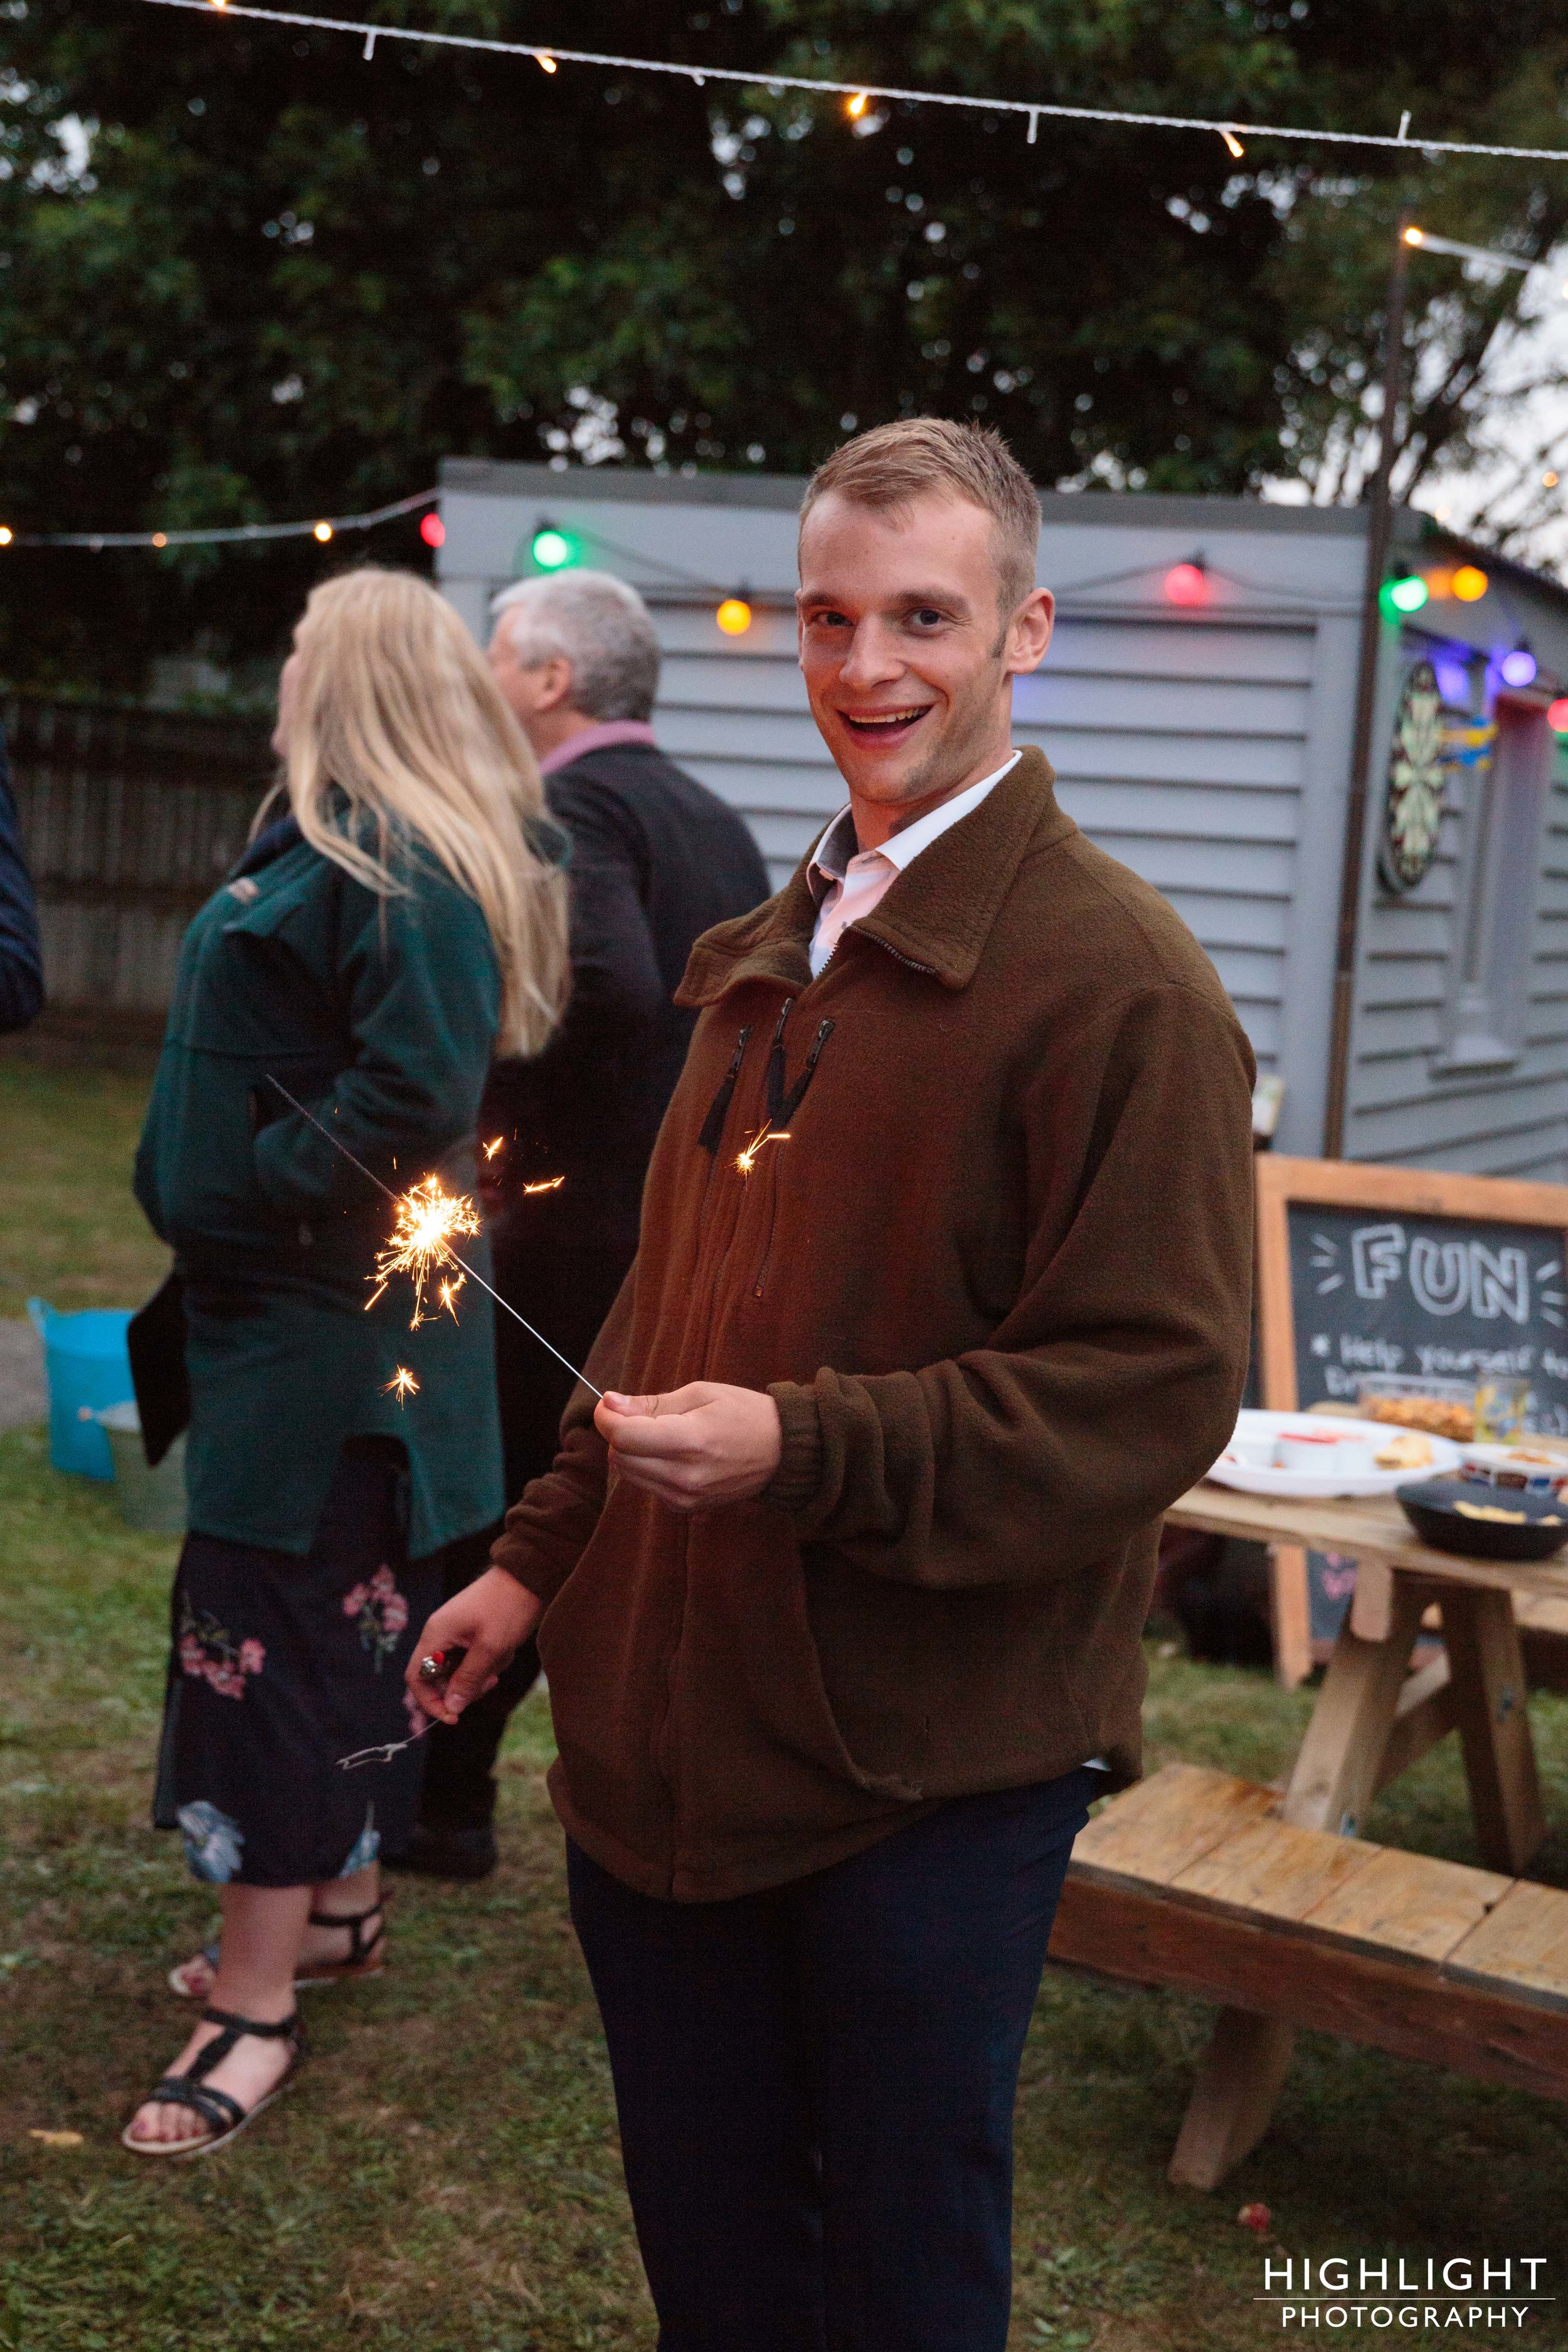 JM-2017-Highlight-wedding-photography-palmerston-north-new-zealand-240.jpg